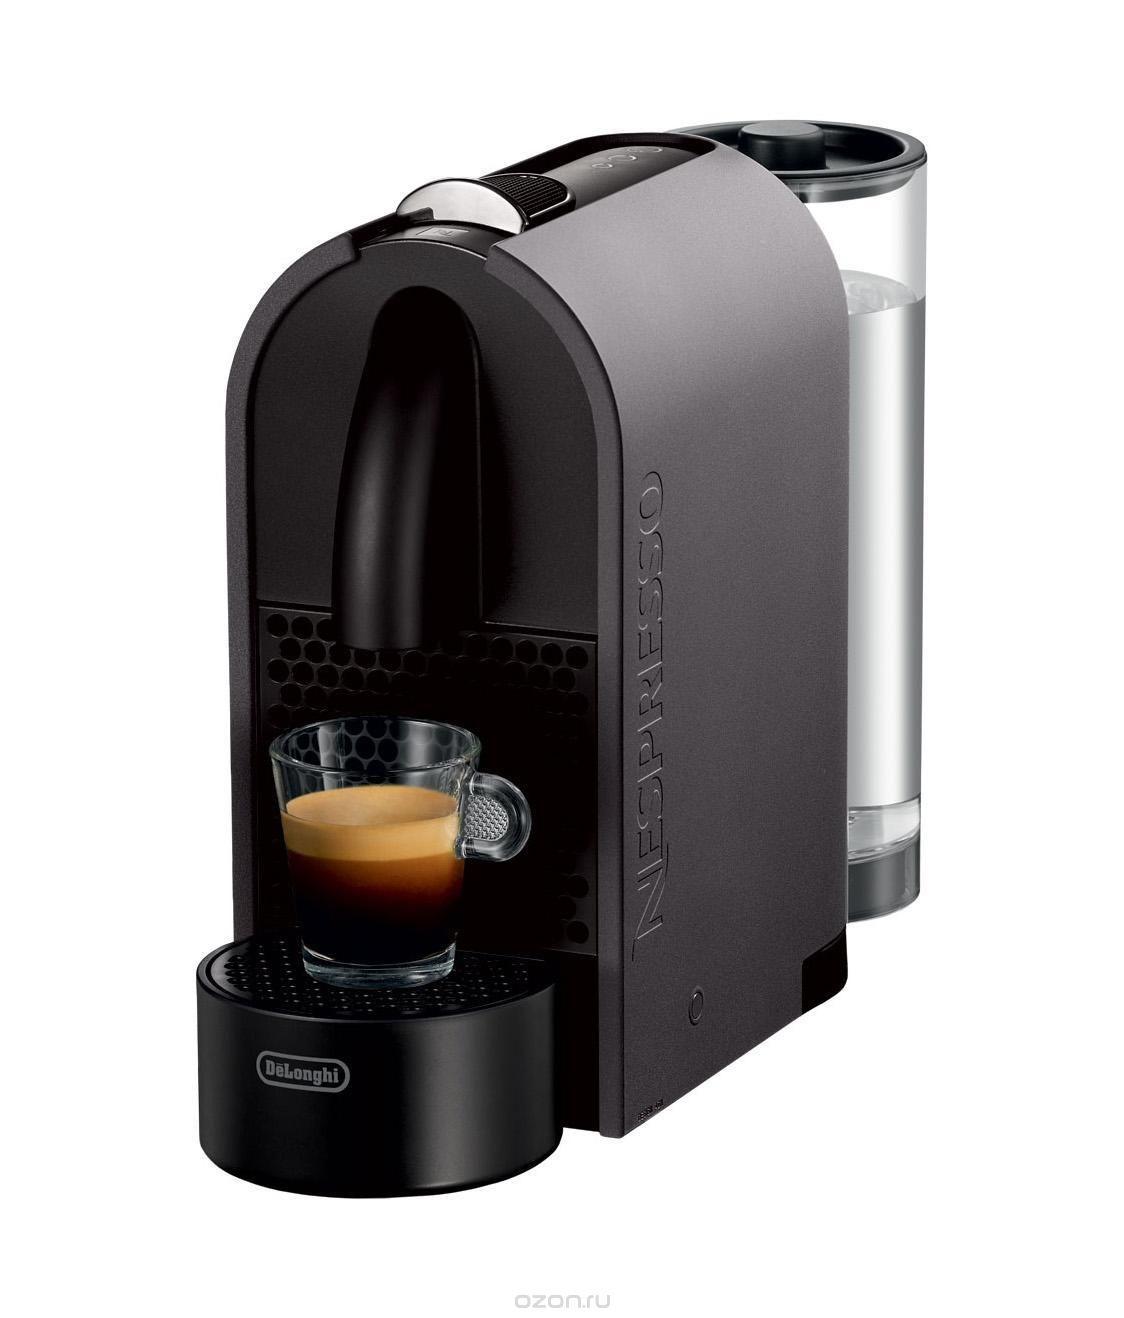 DeLonghi En 110.GY Nespresso кофемашина